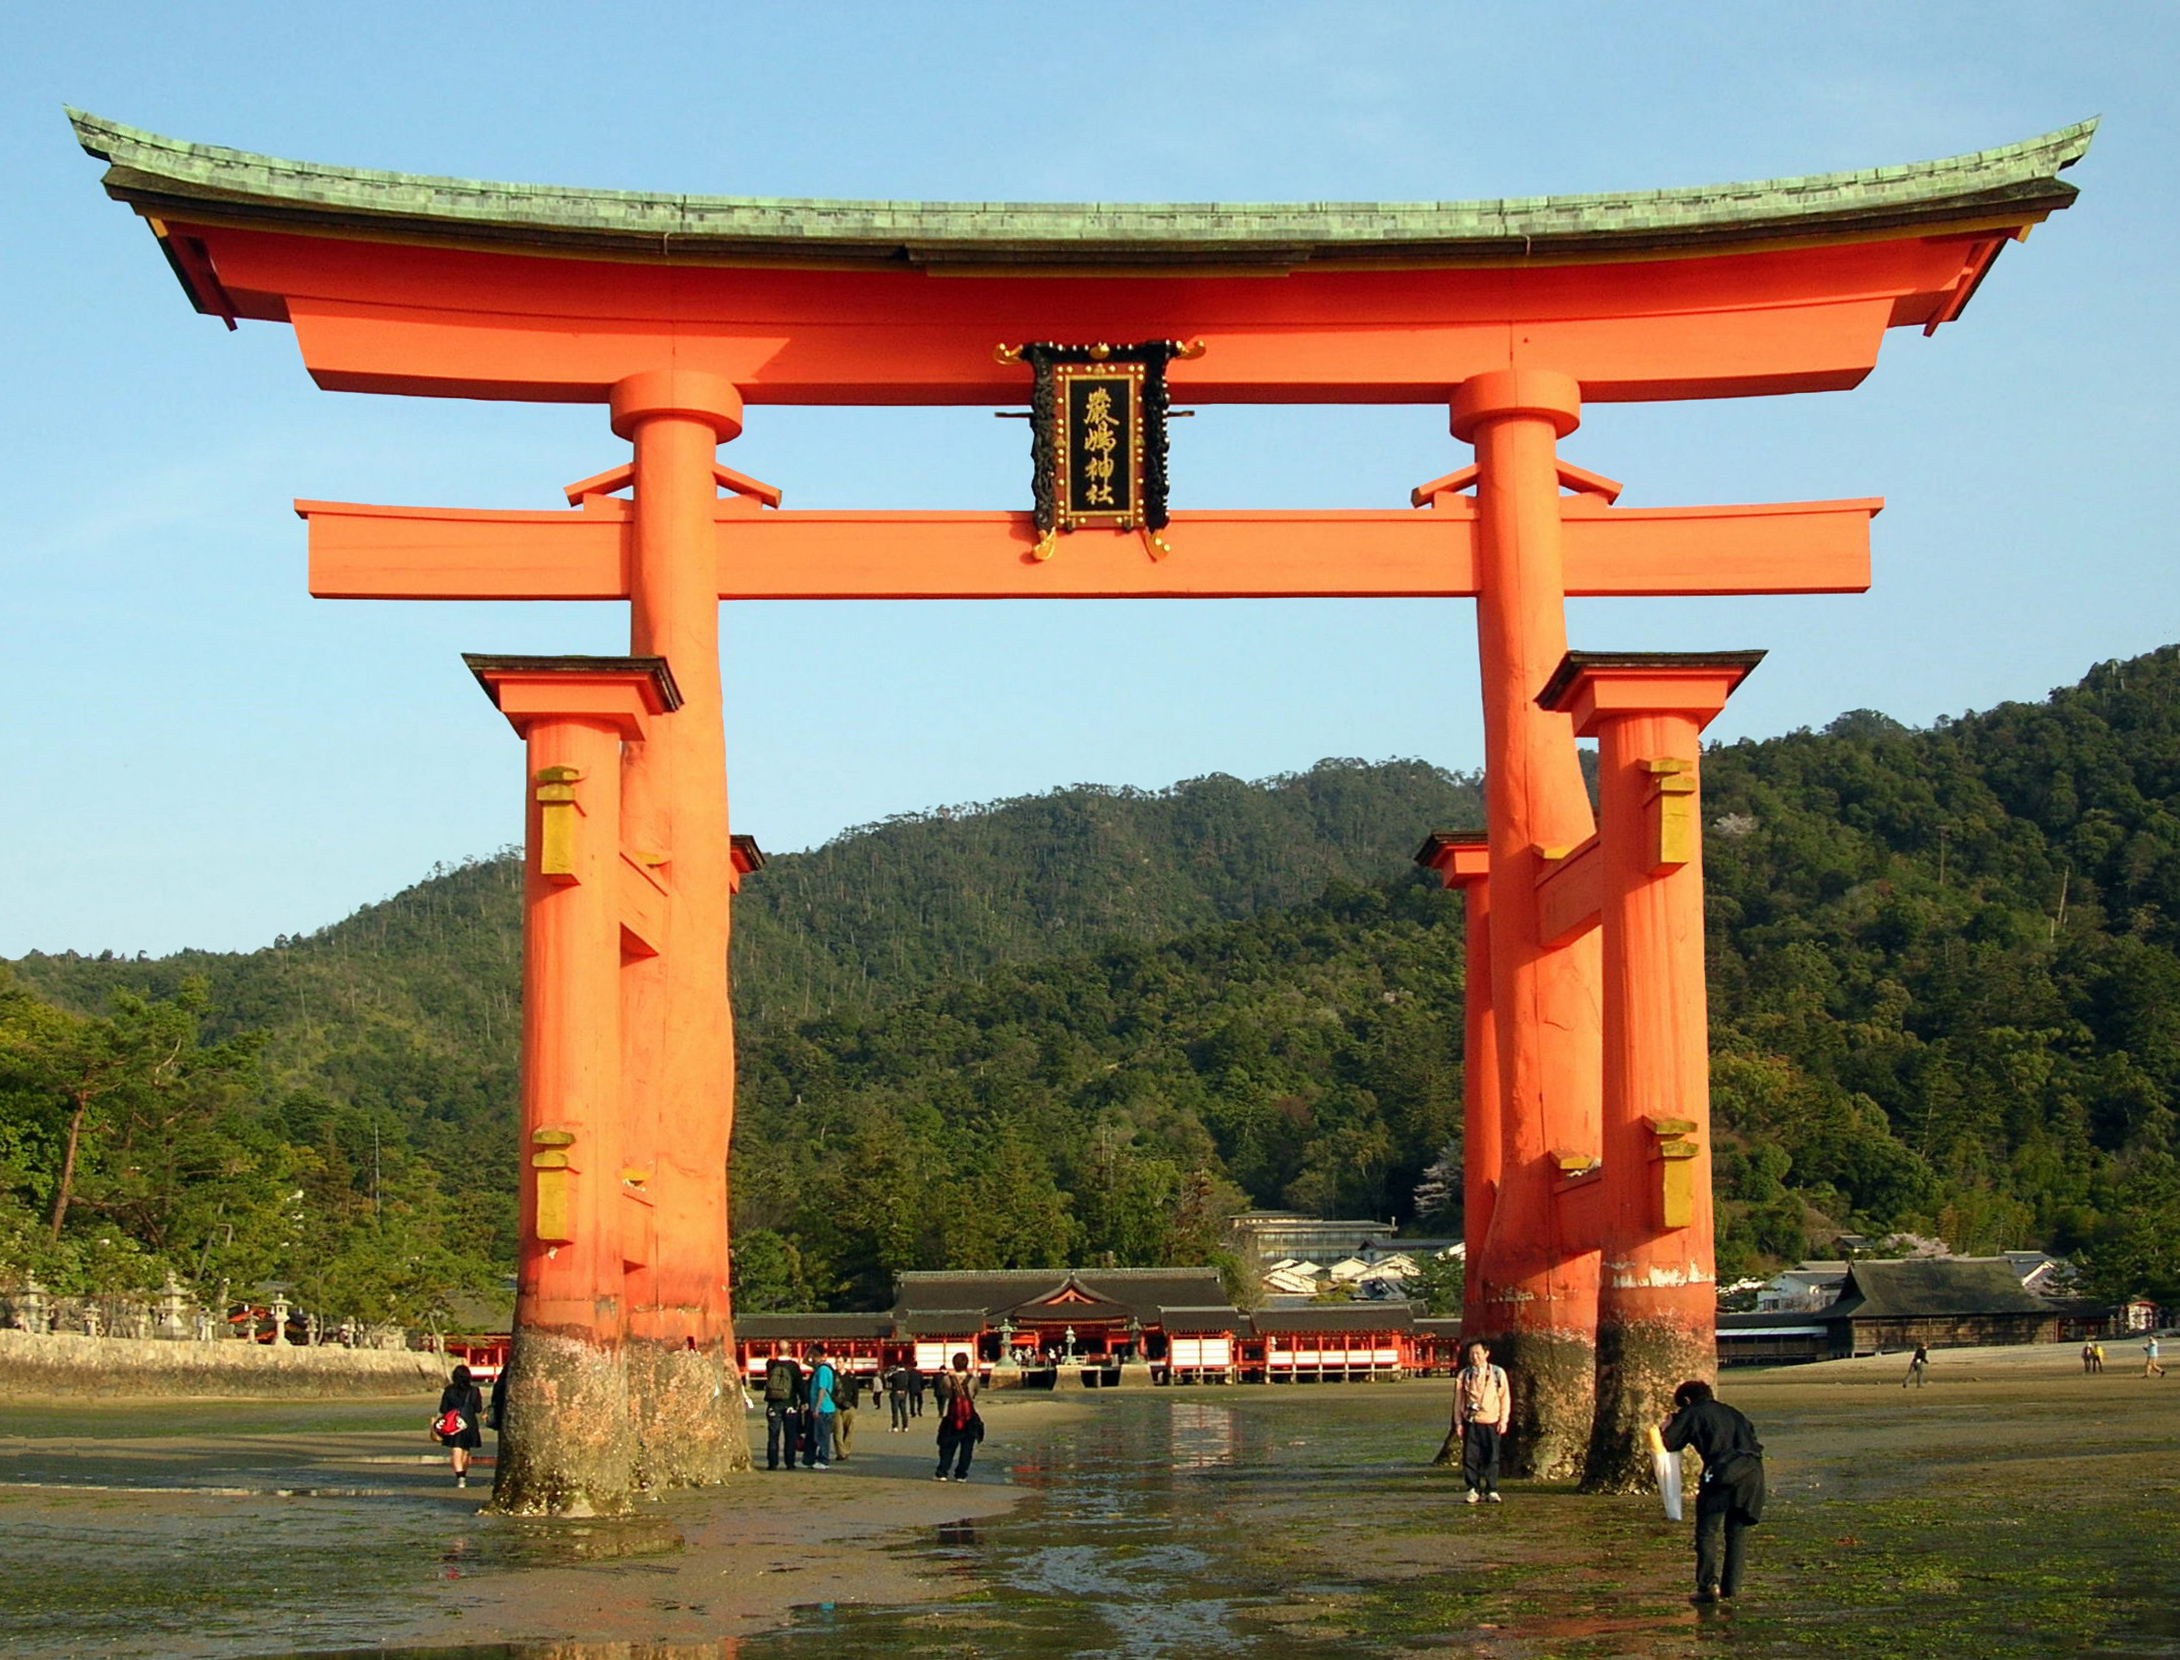 File:Torii and Itsukushima Shrine.jpg - Wikipedia